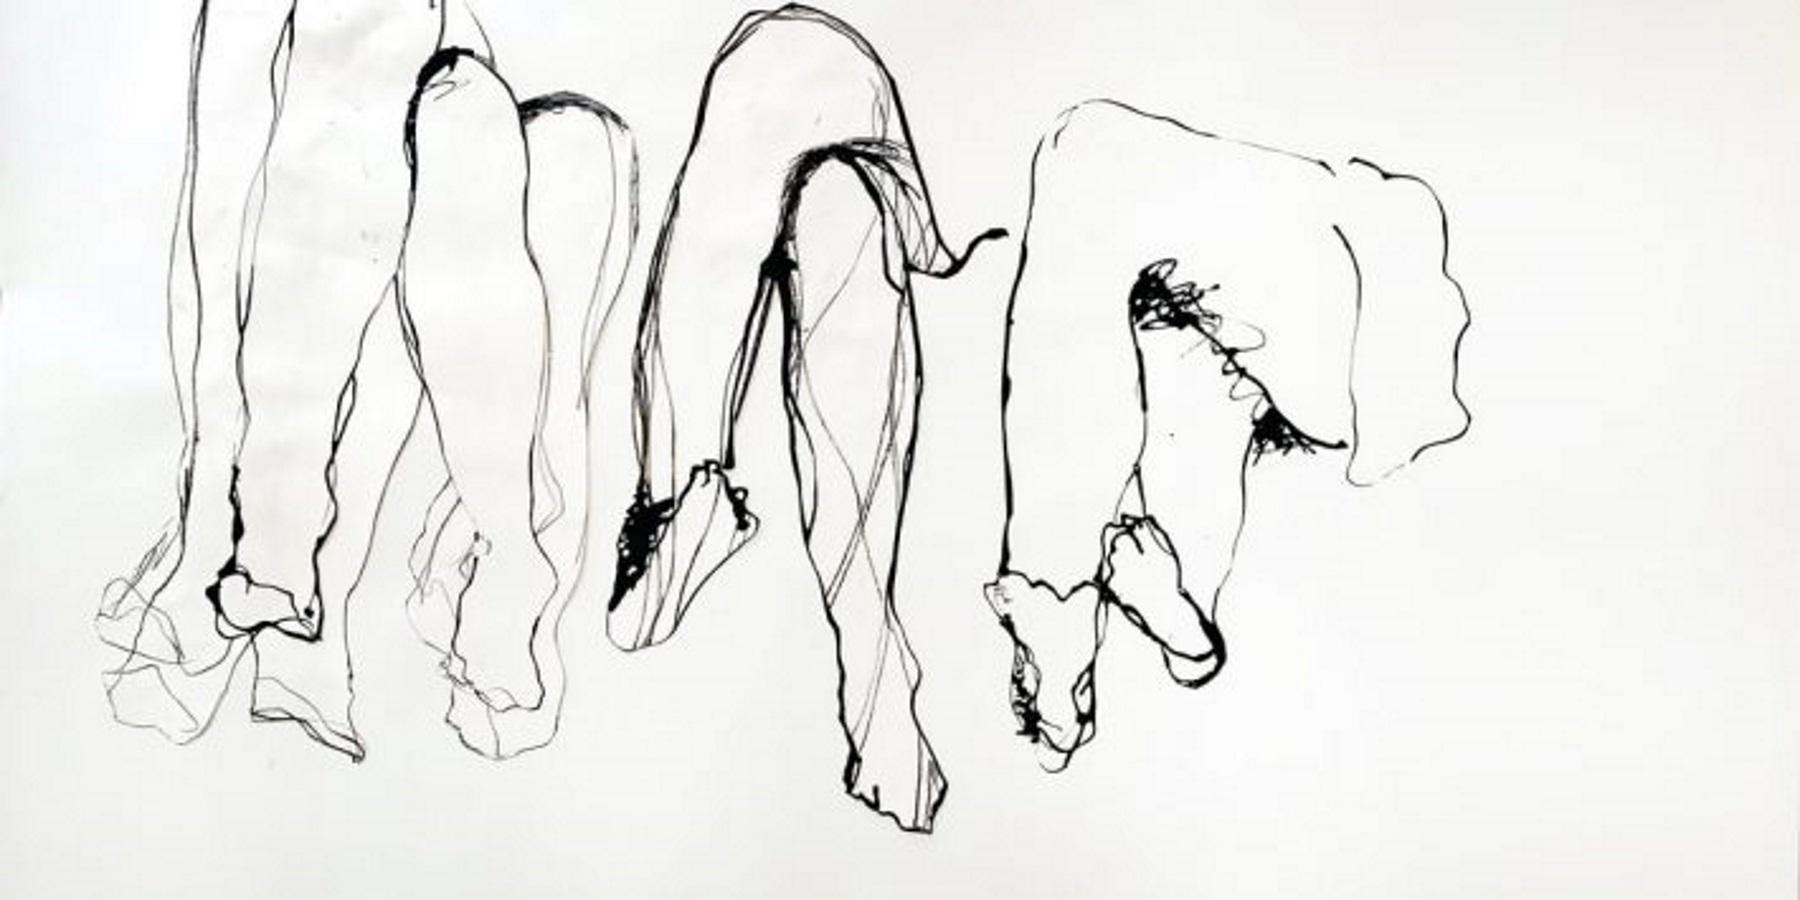 Luzene Hill drawing of crossed legs